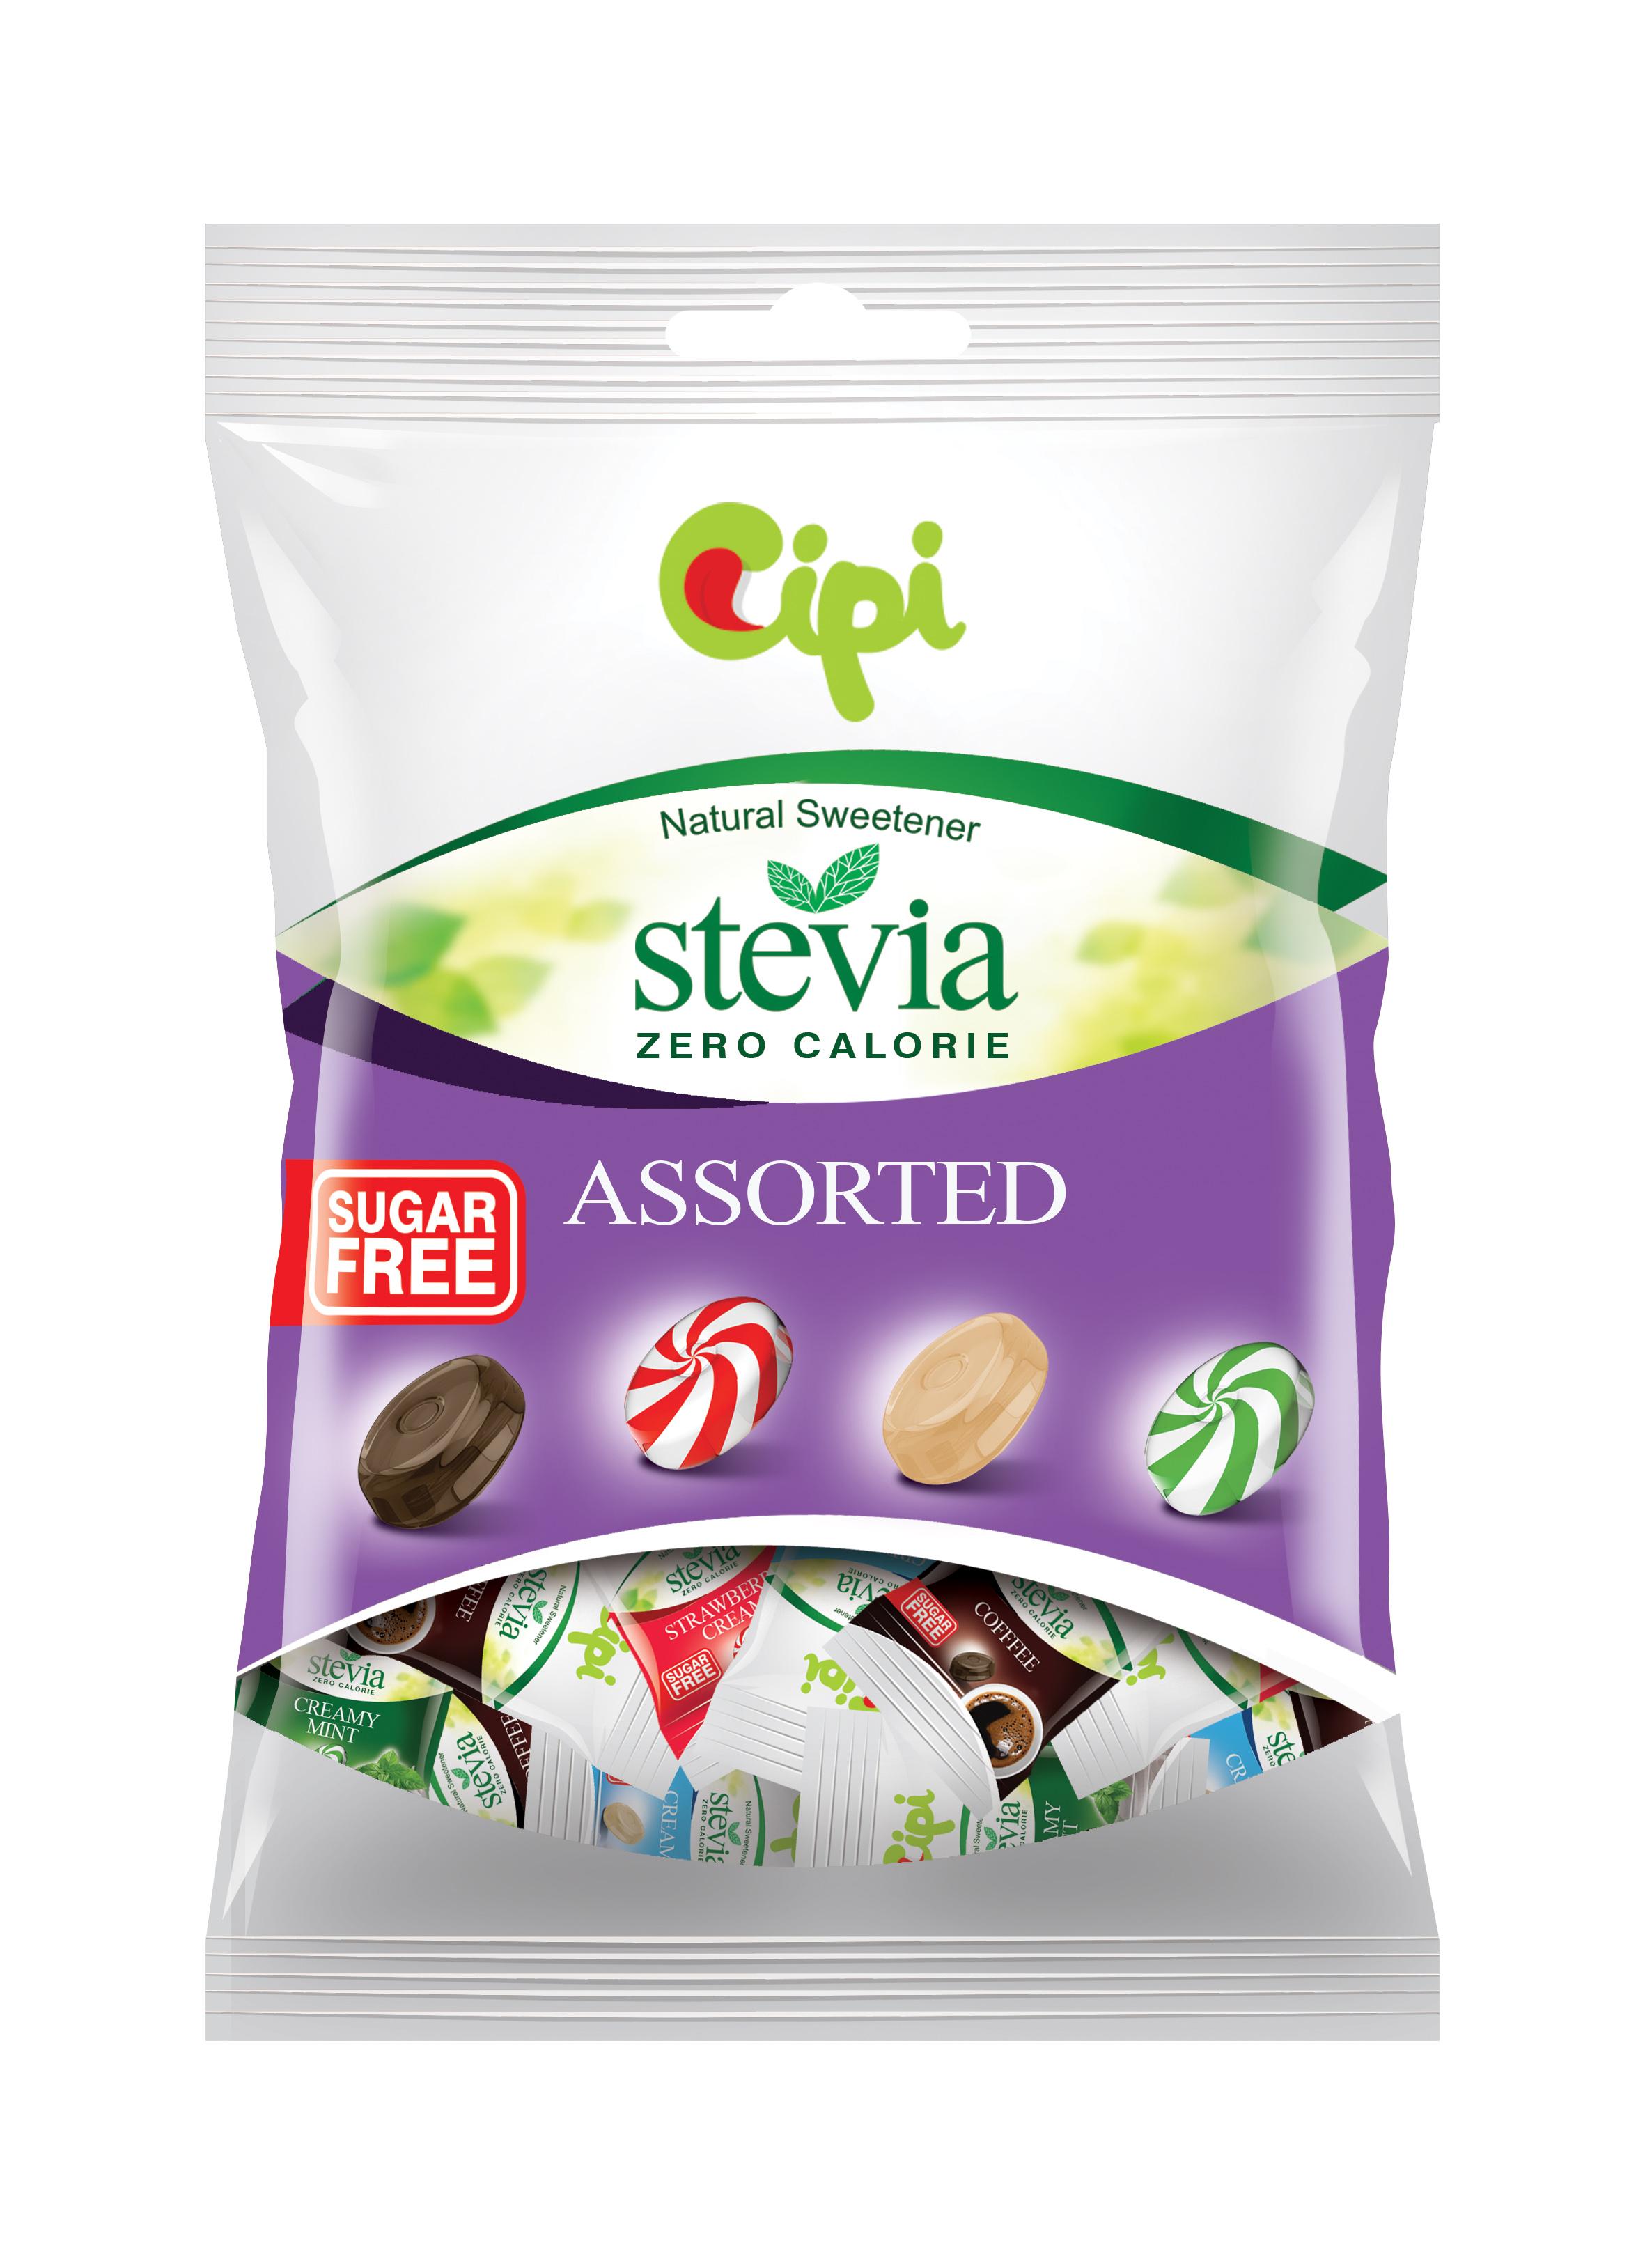 Stevia assorted